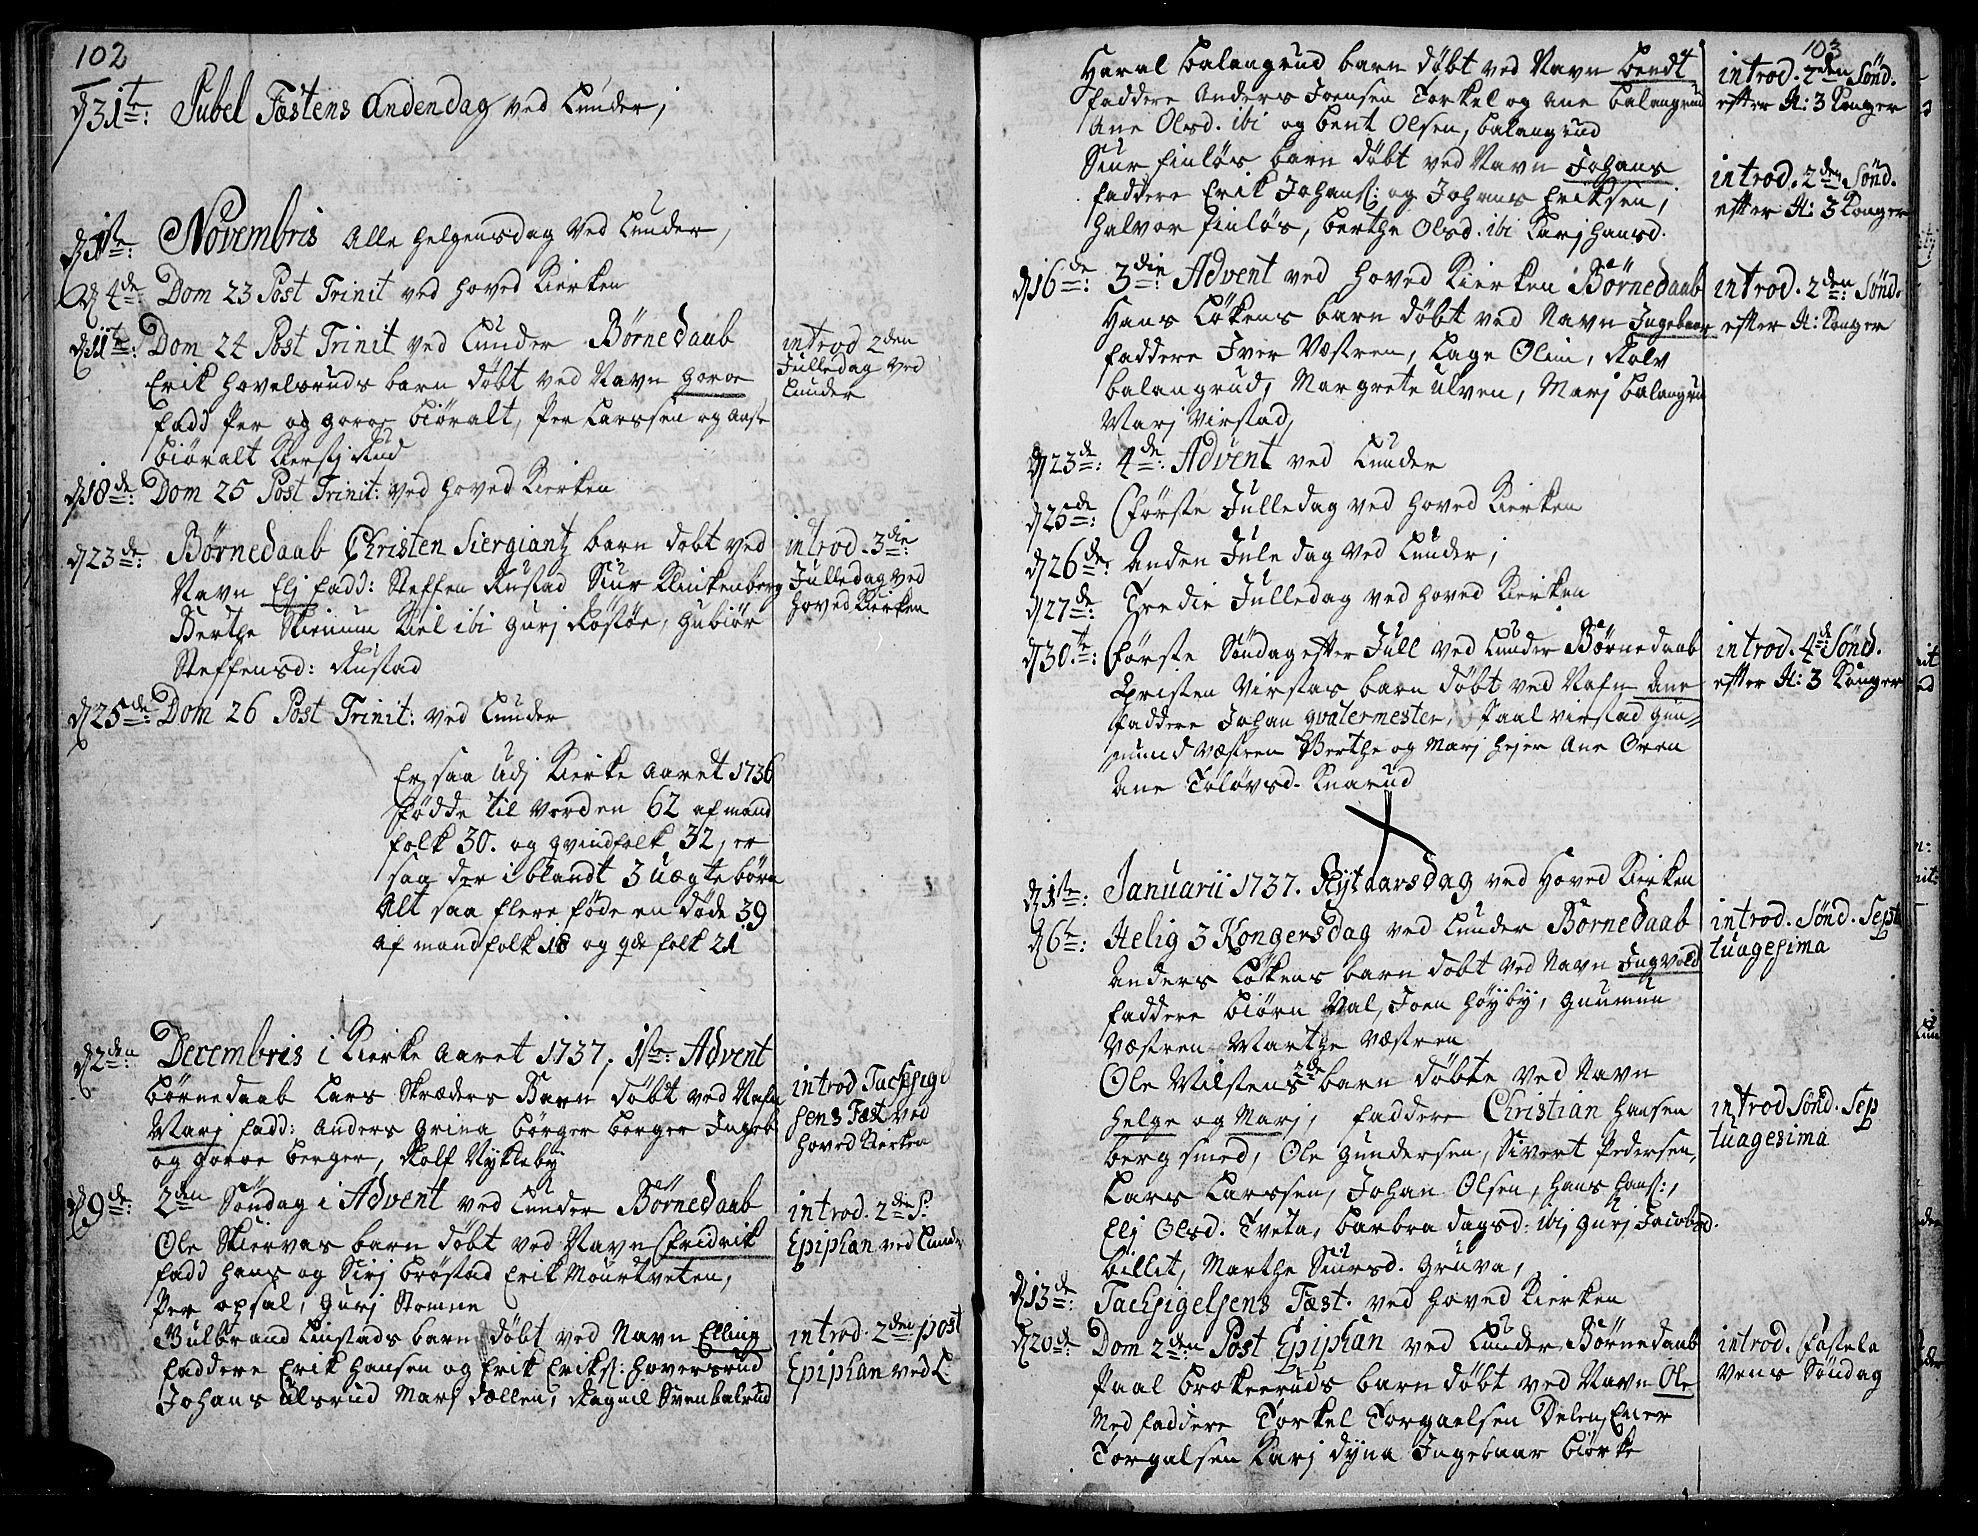 SAH, Jevnaker prestekontor, Ministerialbok nr. 2, 1725-1751, s. 102-103